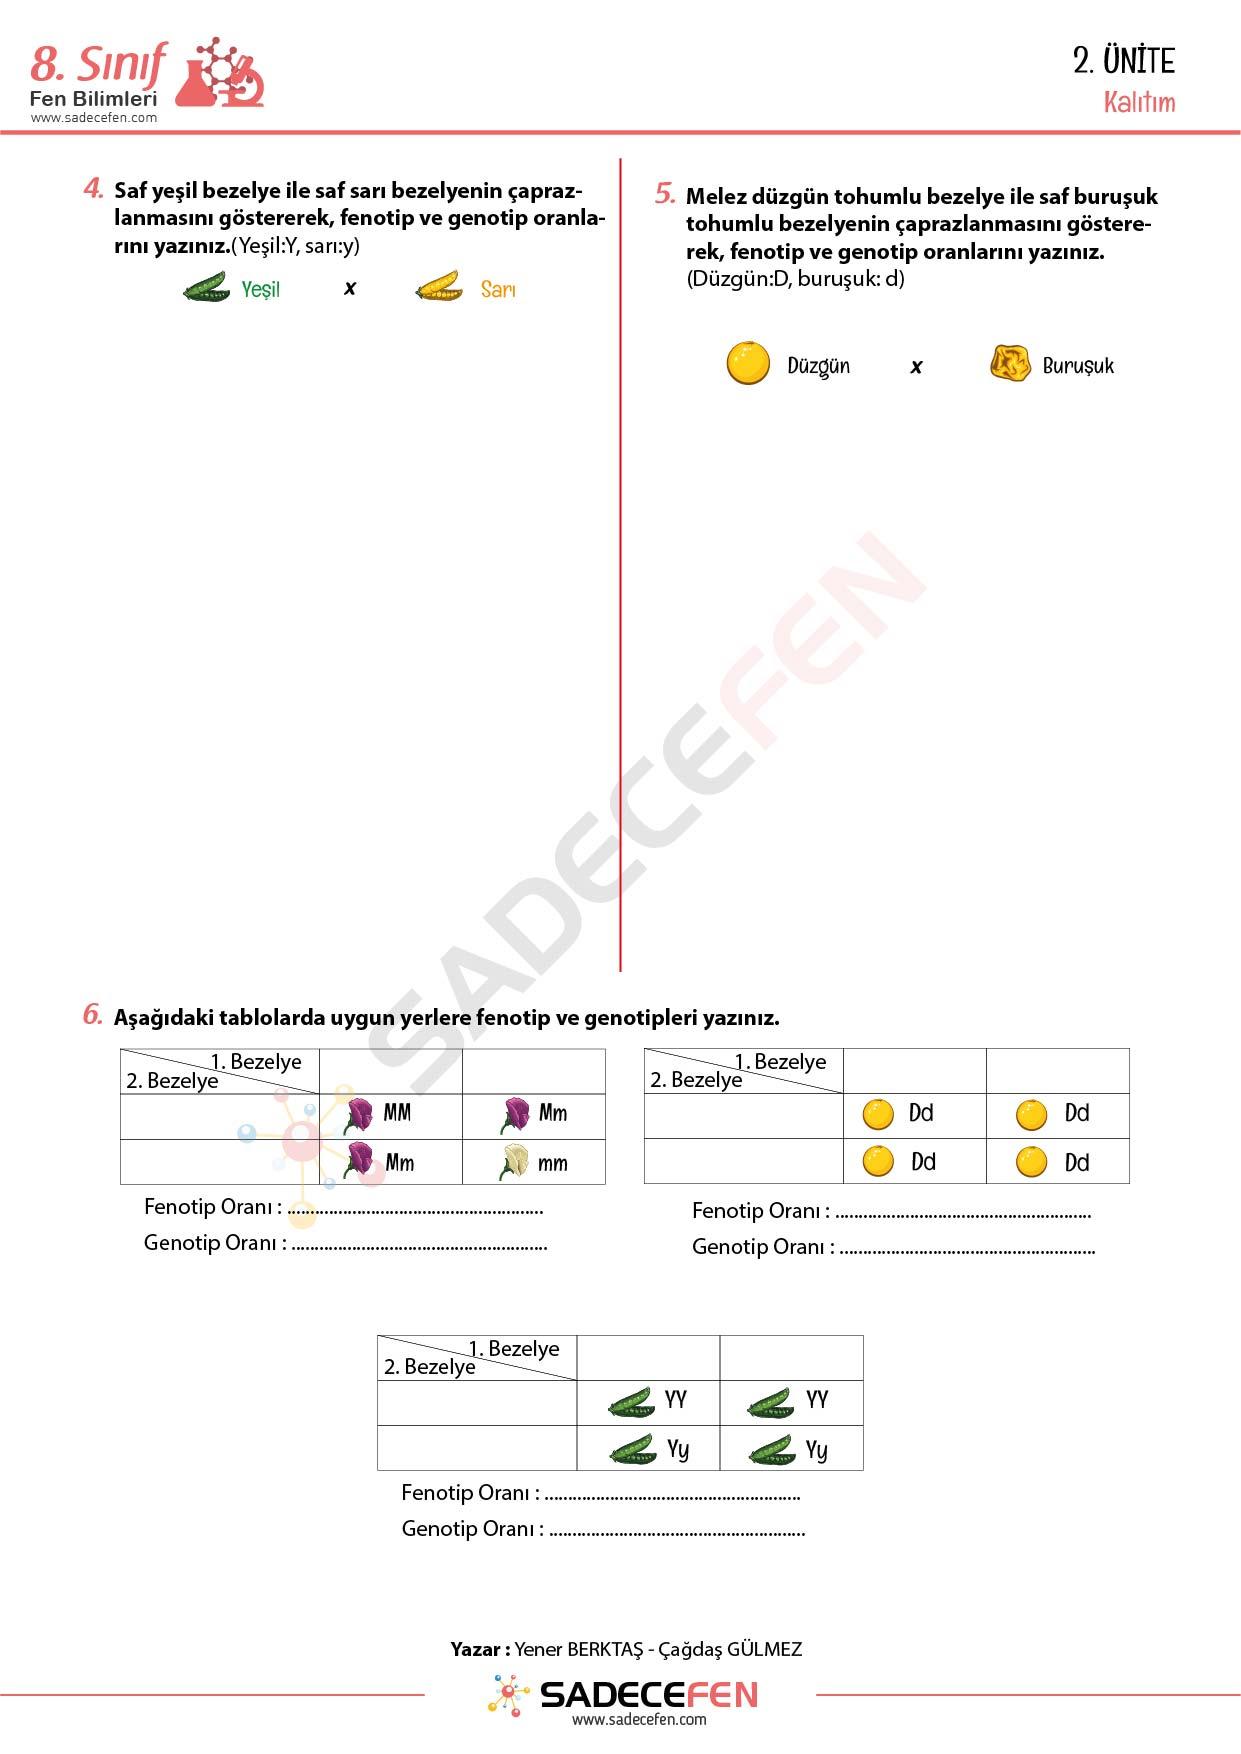 8. Sınıf LGS – Kalıtım Çalışma Kağıdı PDF İndir